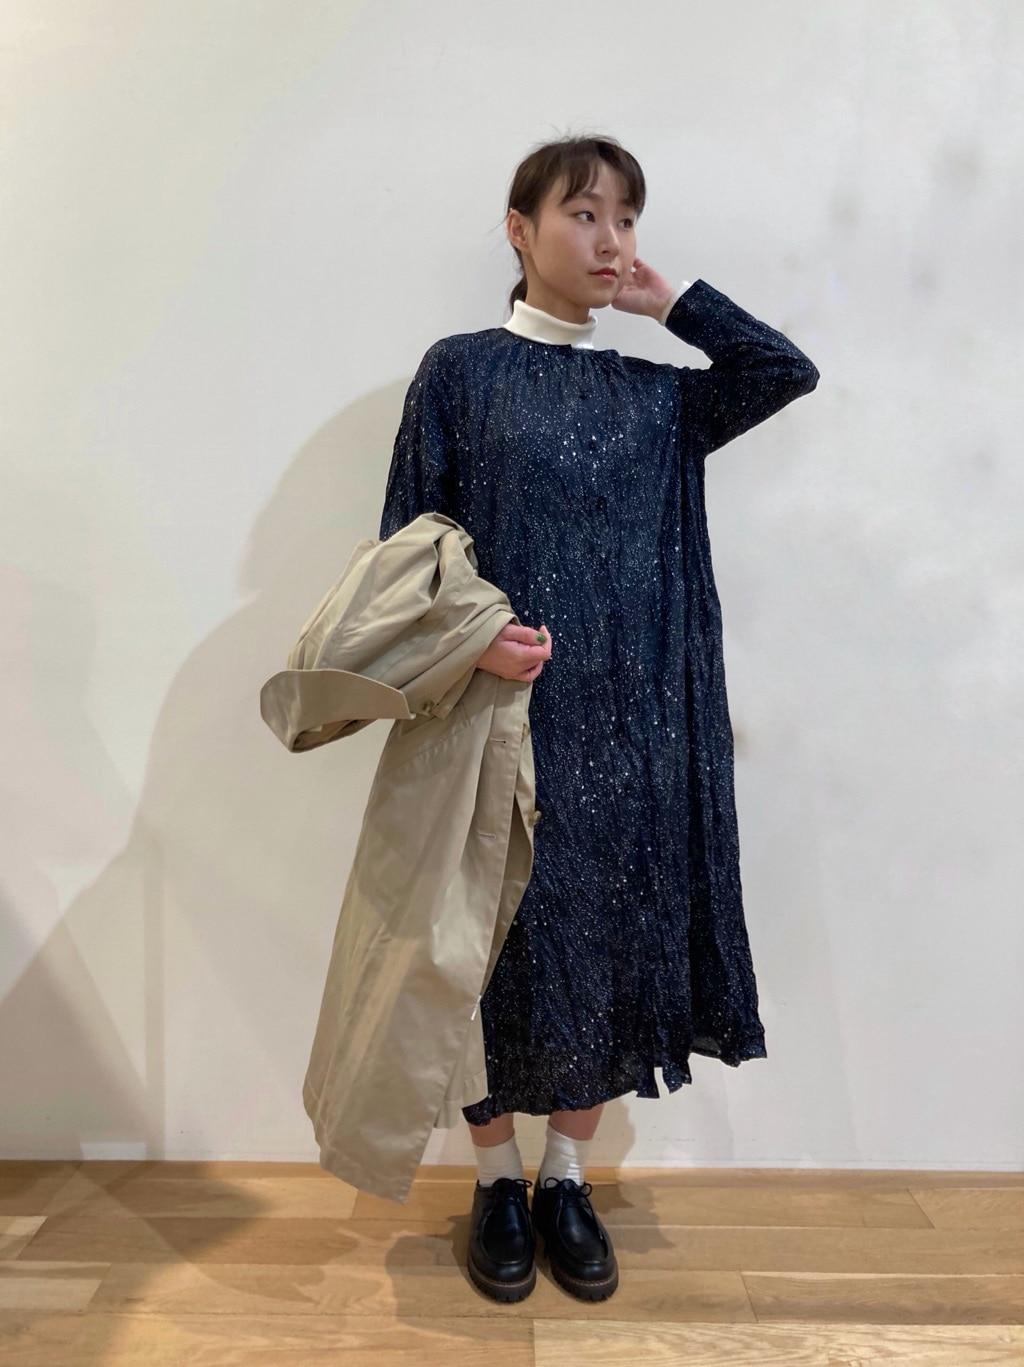 bulle de savon KITTE丸の内 身長:159cm 2021.01.12